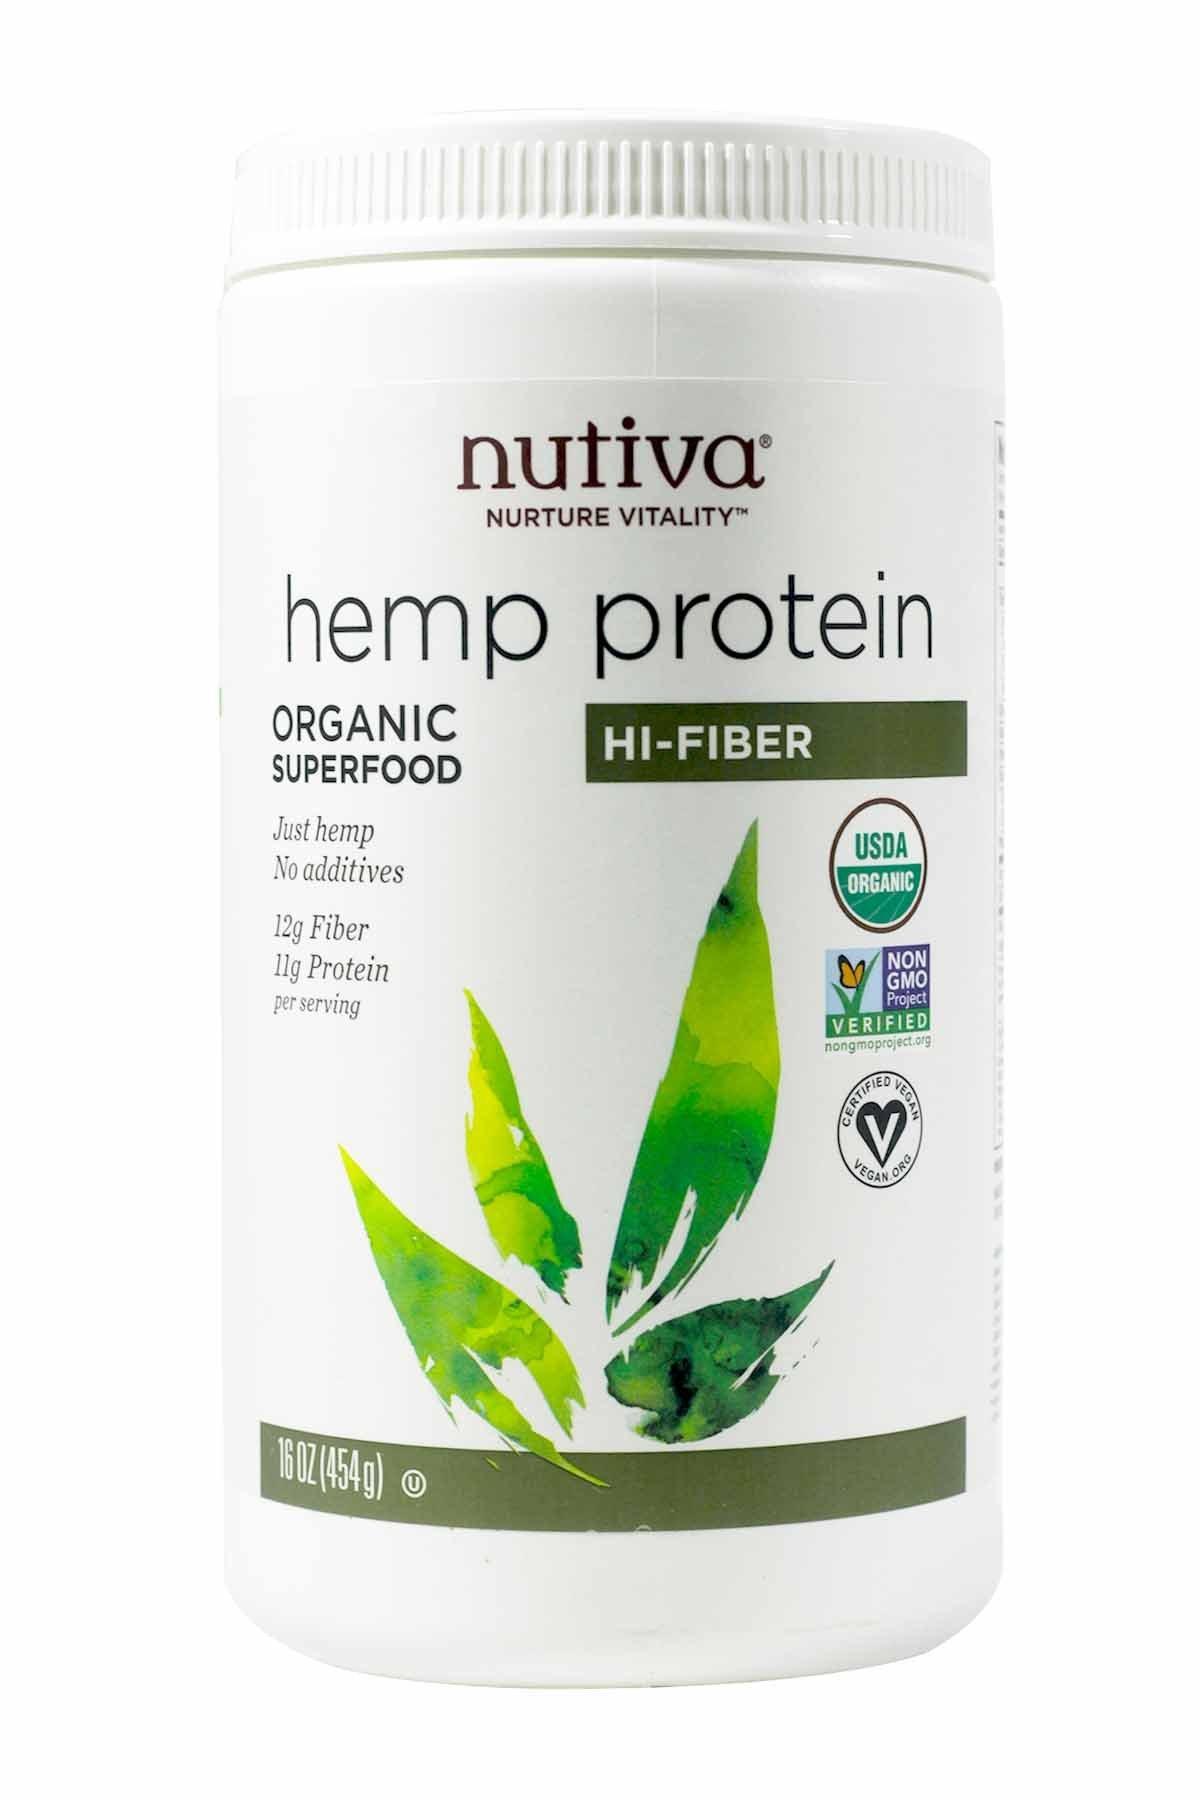 Nutiva Hemp Protein Powder, Organic,16 ounce(454 g) by Nutiva